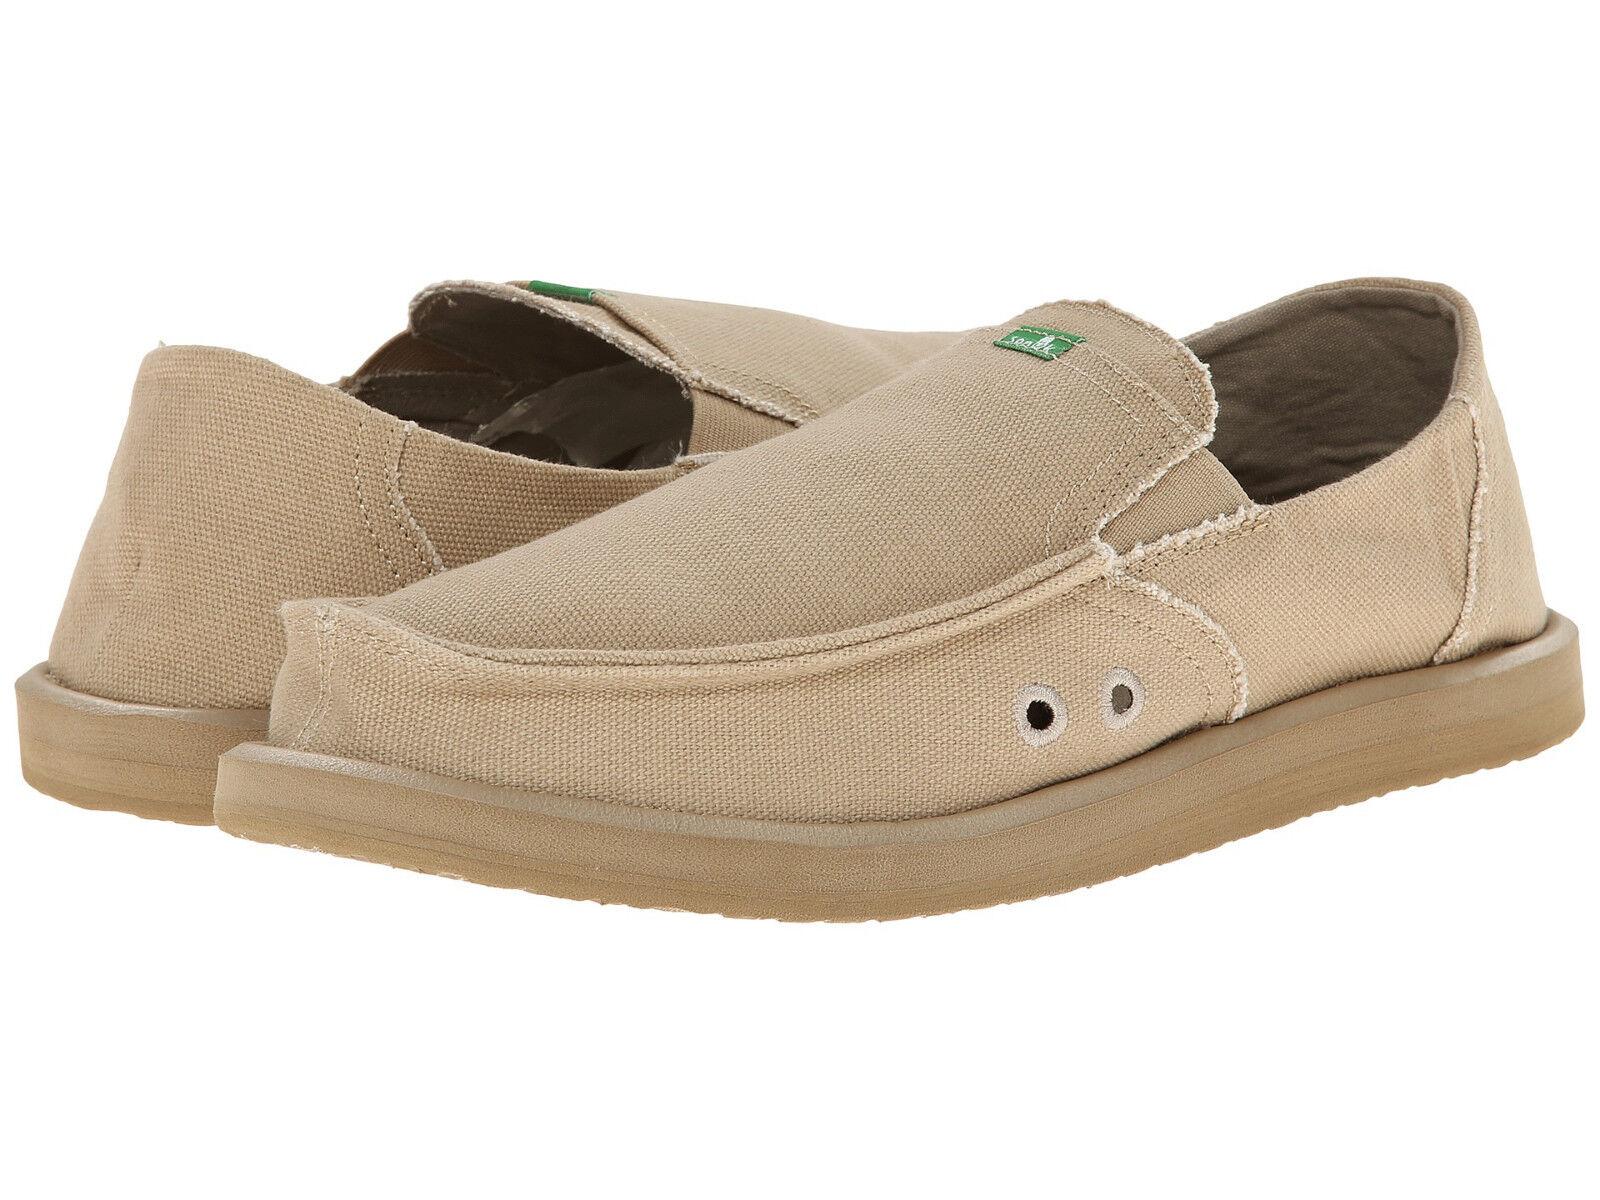 Men Sanuk Pick Pocket Slip On Loafer SMF1032 Tan 100% Original Brand New